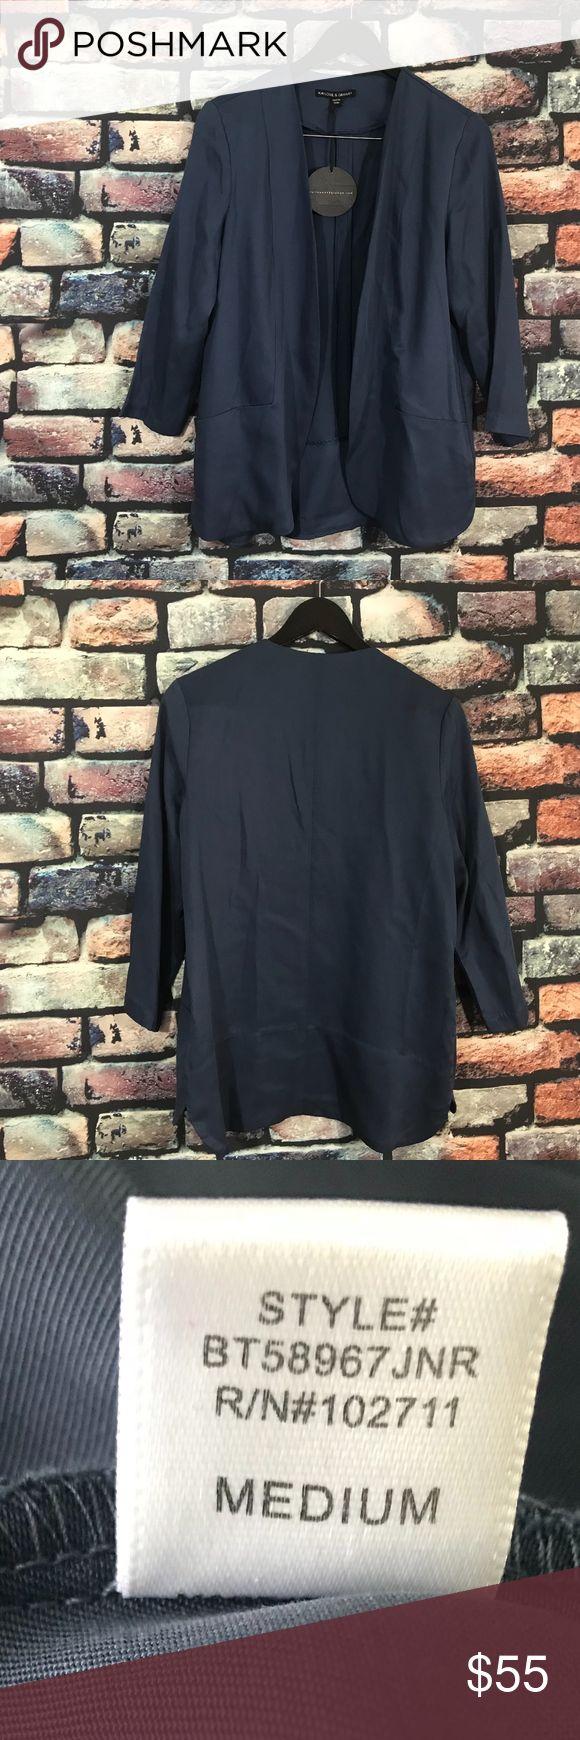 "Harlowe & Graham Curved Blazer Navy NWOT Harlowe & Graham Curved Open Front Blazer NWOT  3/4 Sleeves  Size M  Navy Blue   Armpit to Armpit- 19.5"" Sleeves- 18.5"" Length-  26.5""  pU18 Harlowe & Graham Jackets & Coats Blazers"